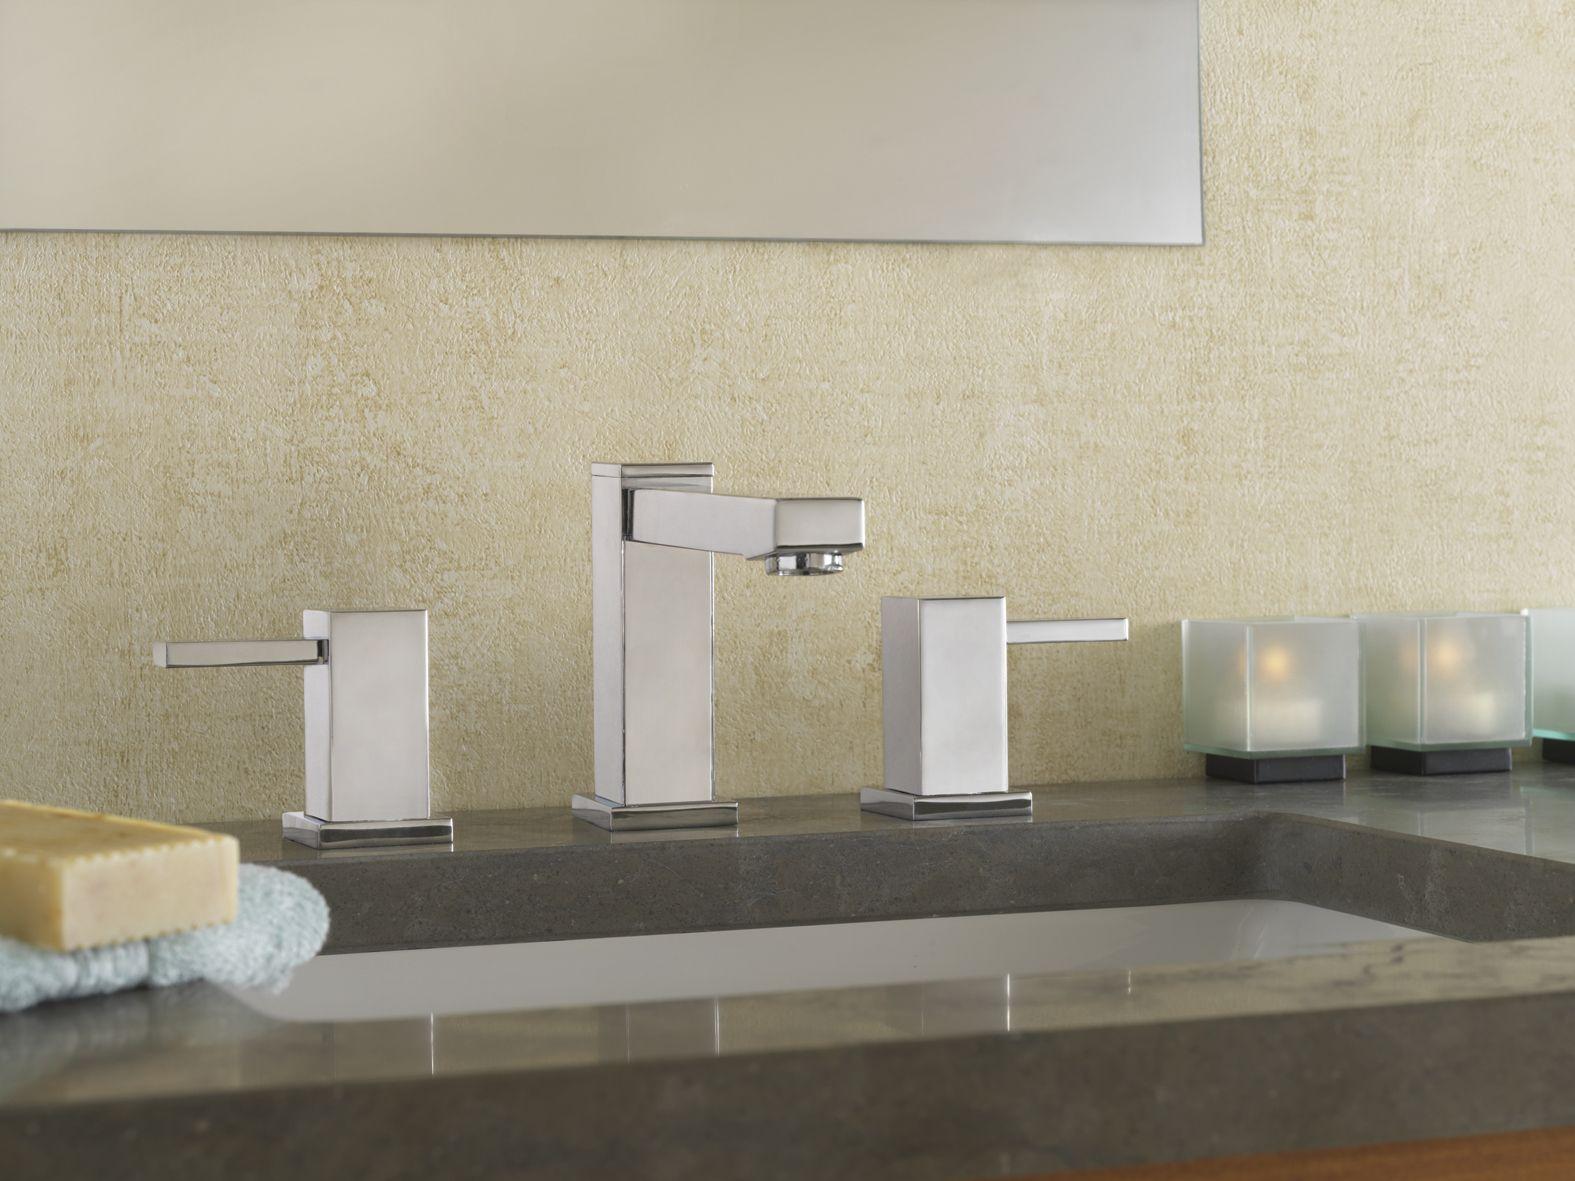 danze reef two handle widespread faucet! d304033 | in the bathroom, Hause ideen